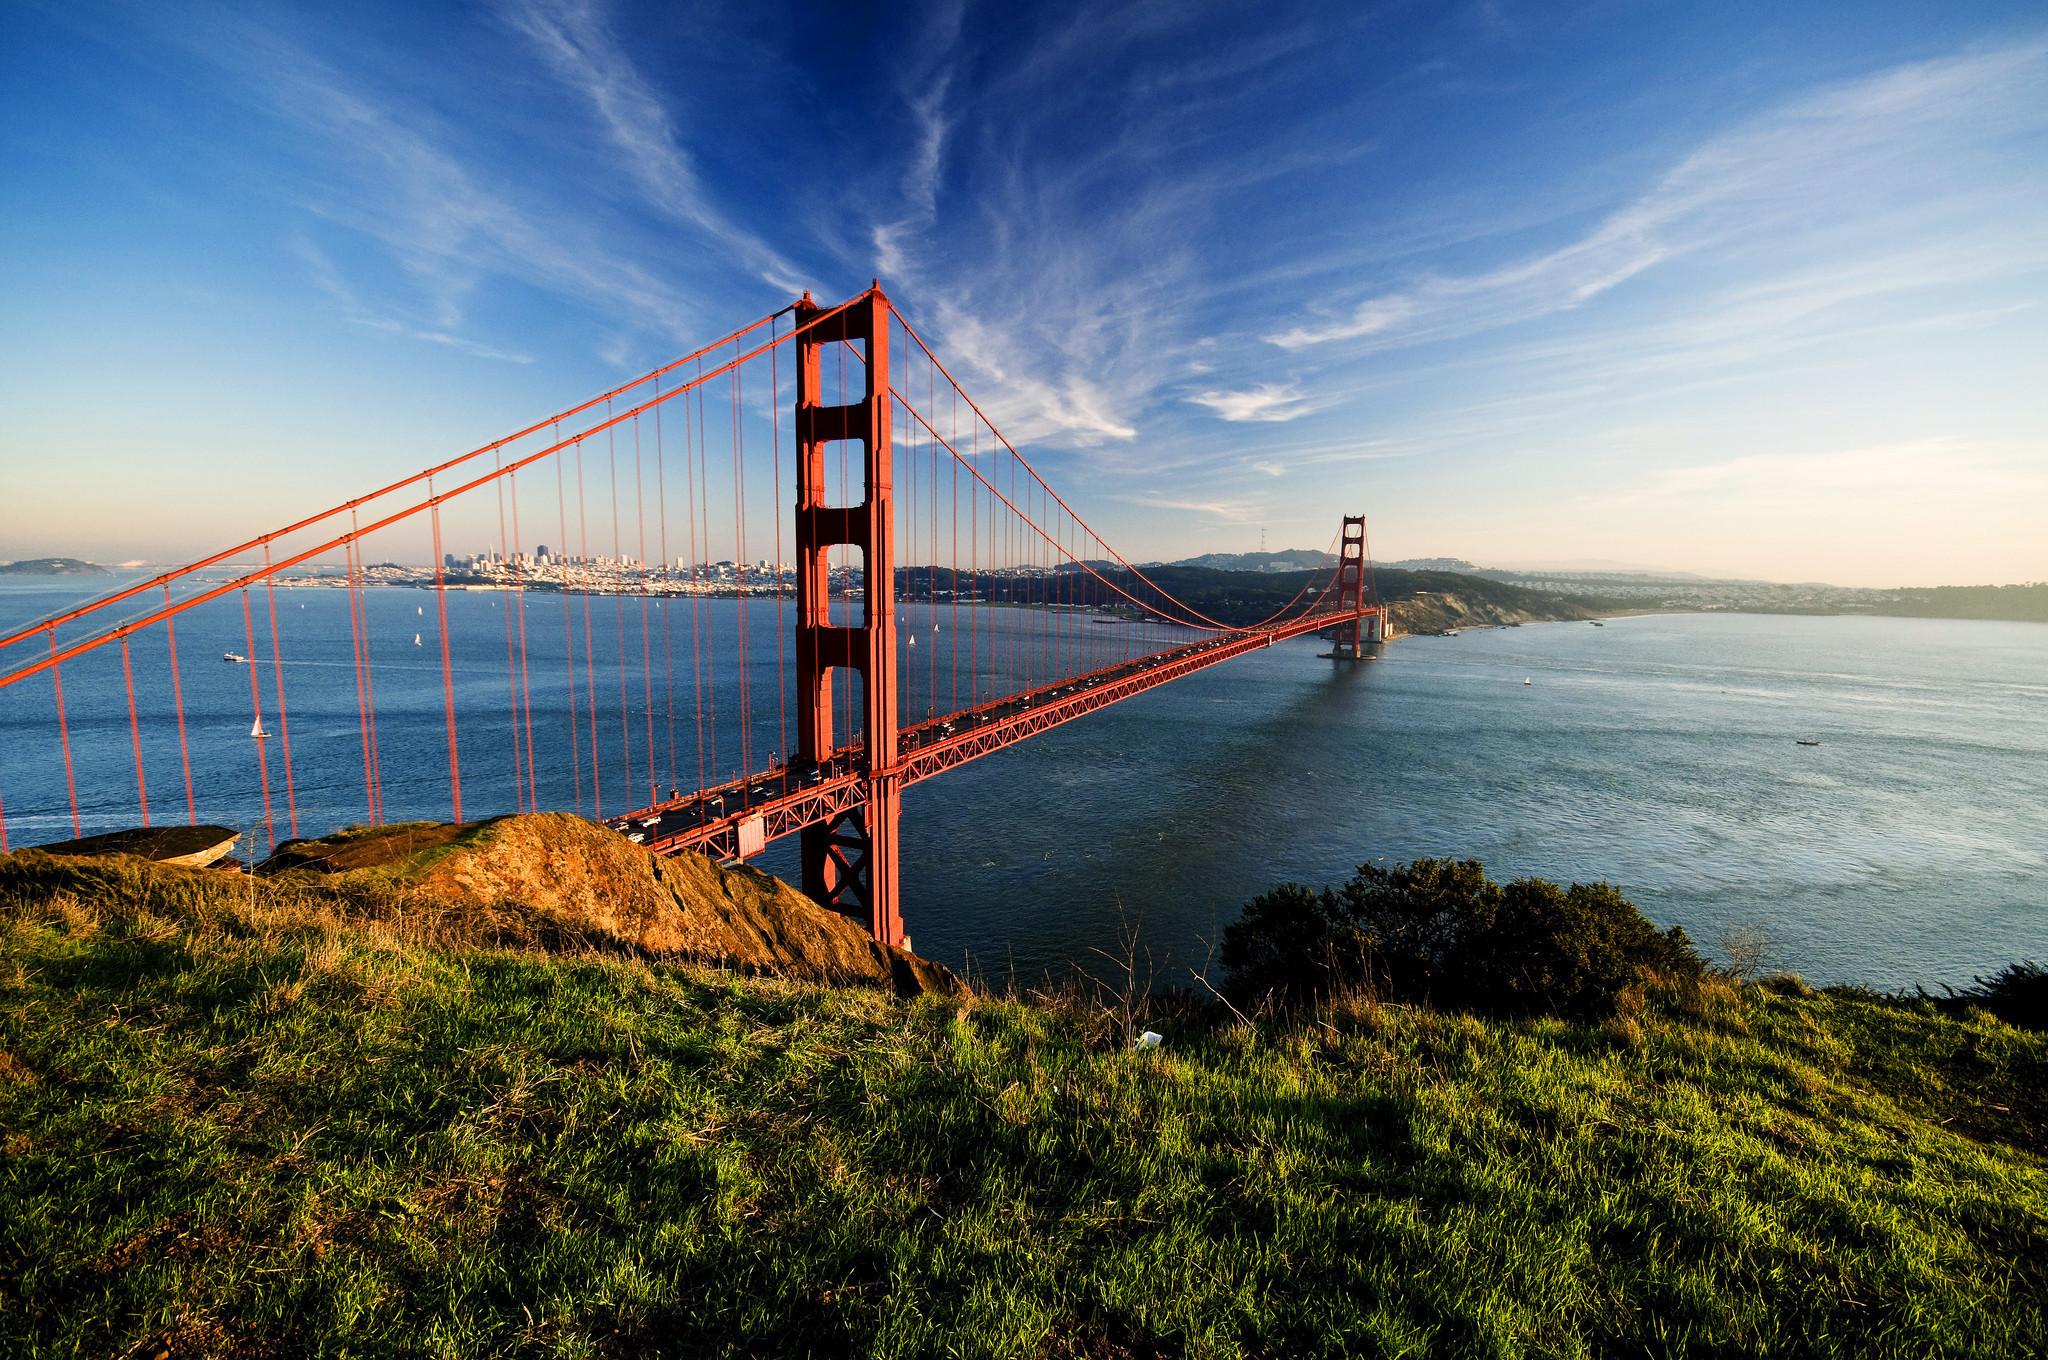 Golden Gate Bridge Gets 76 Million For Suicide Prevention